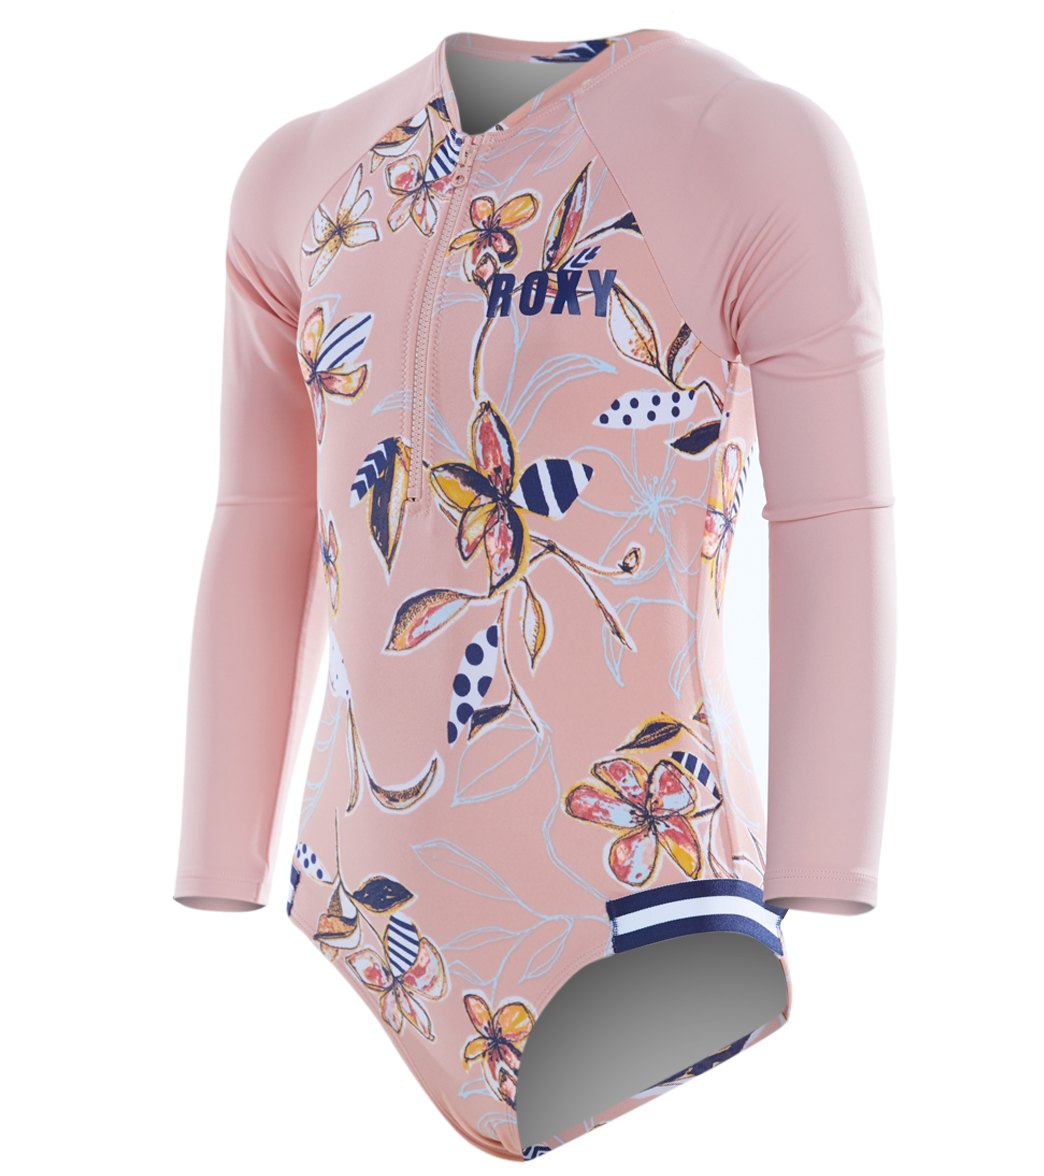 38c8206319 Roxy Girls' Long Sleeve Zip One Piece Rashguard Swimsuit (Toddler ...